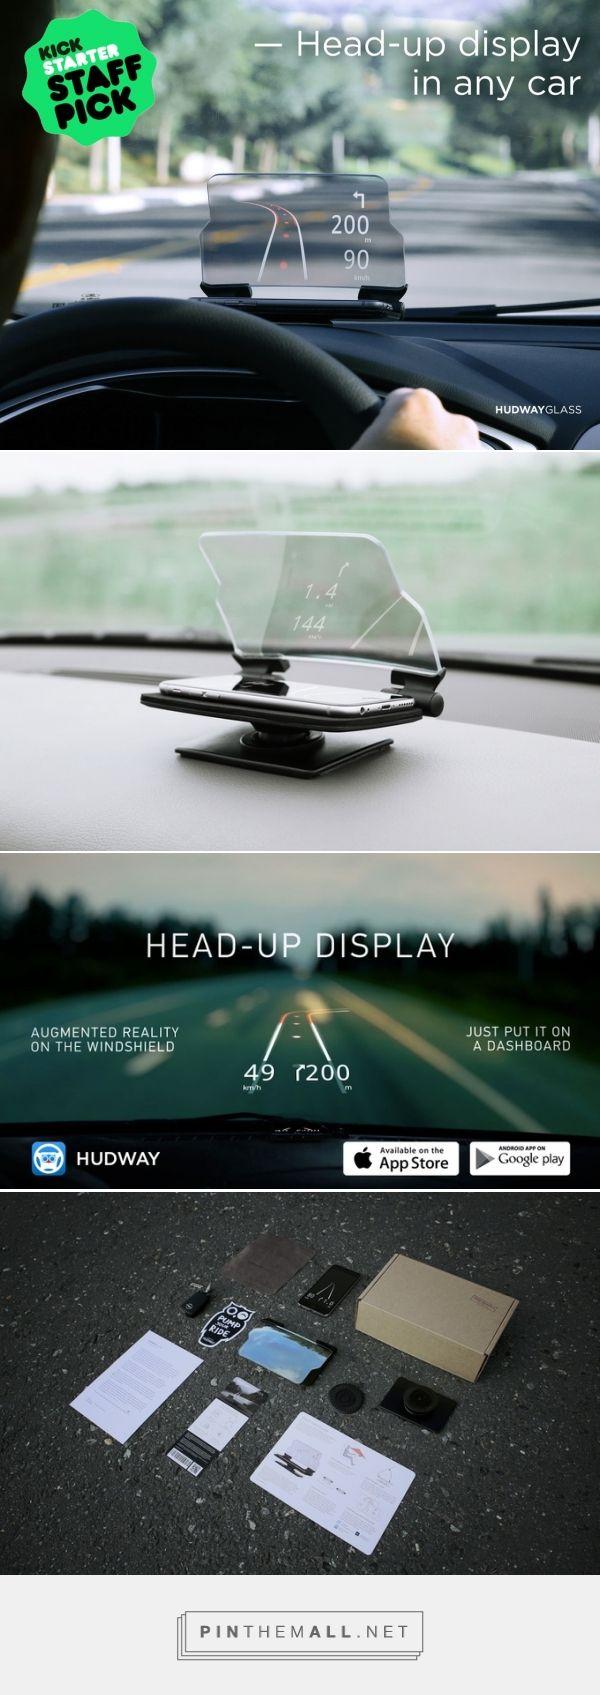 781 best energie images on Pinterest | Light design, Light fixtures ...